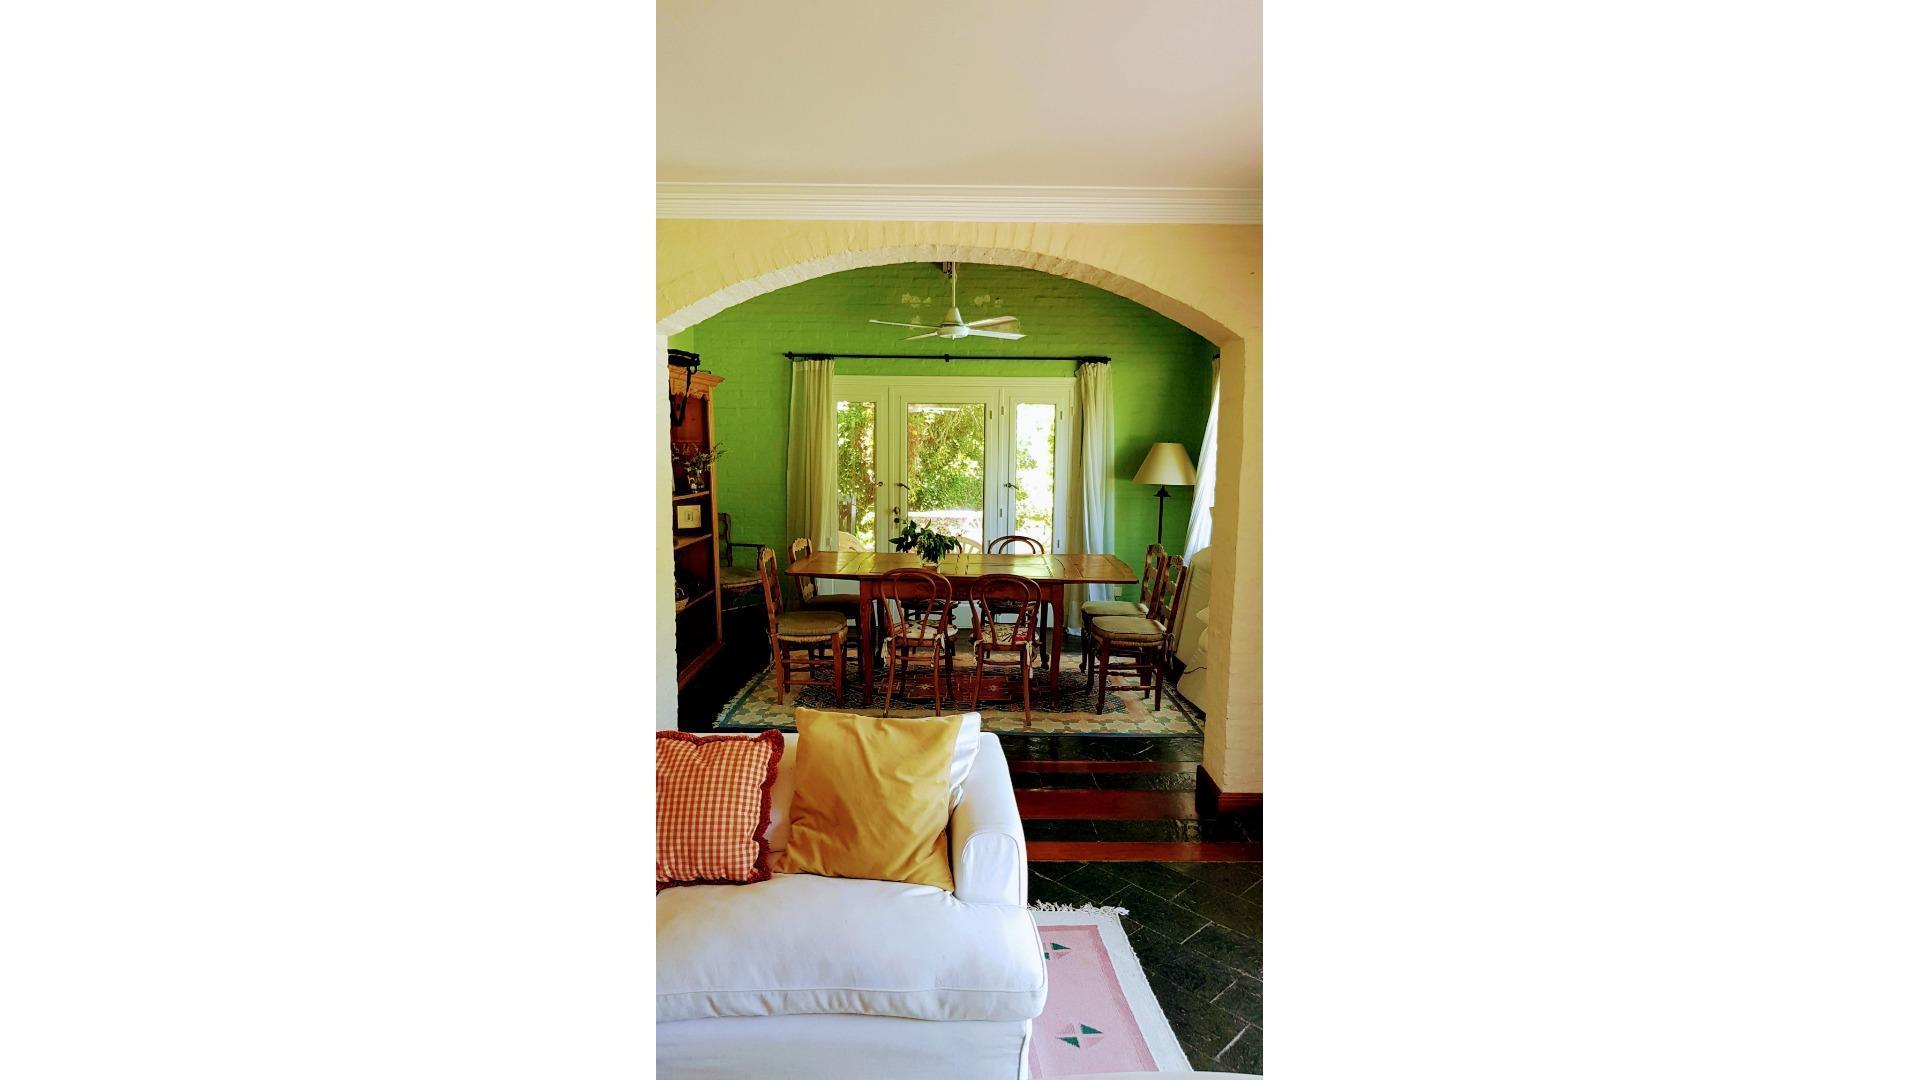 Casa en venta con pileta en barrio Martindale CC, Pilar - Foto 14